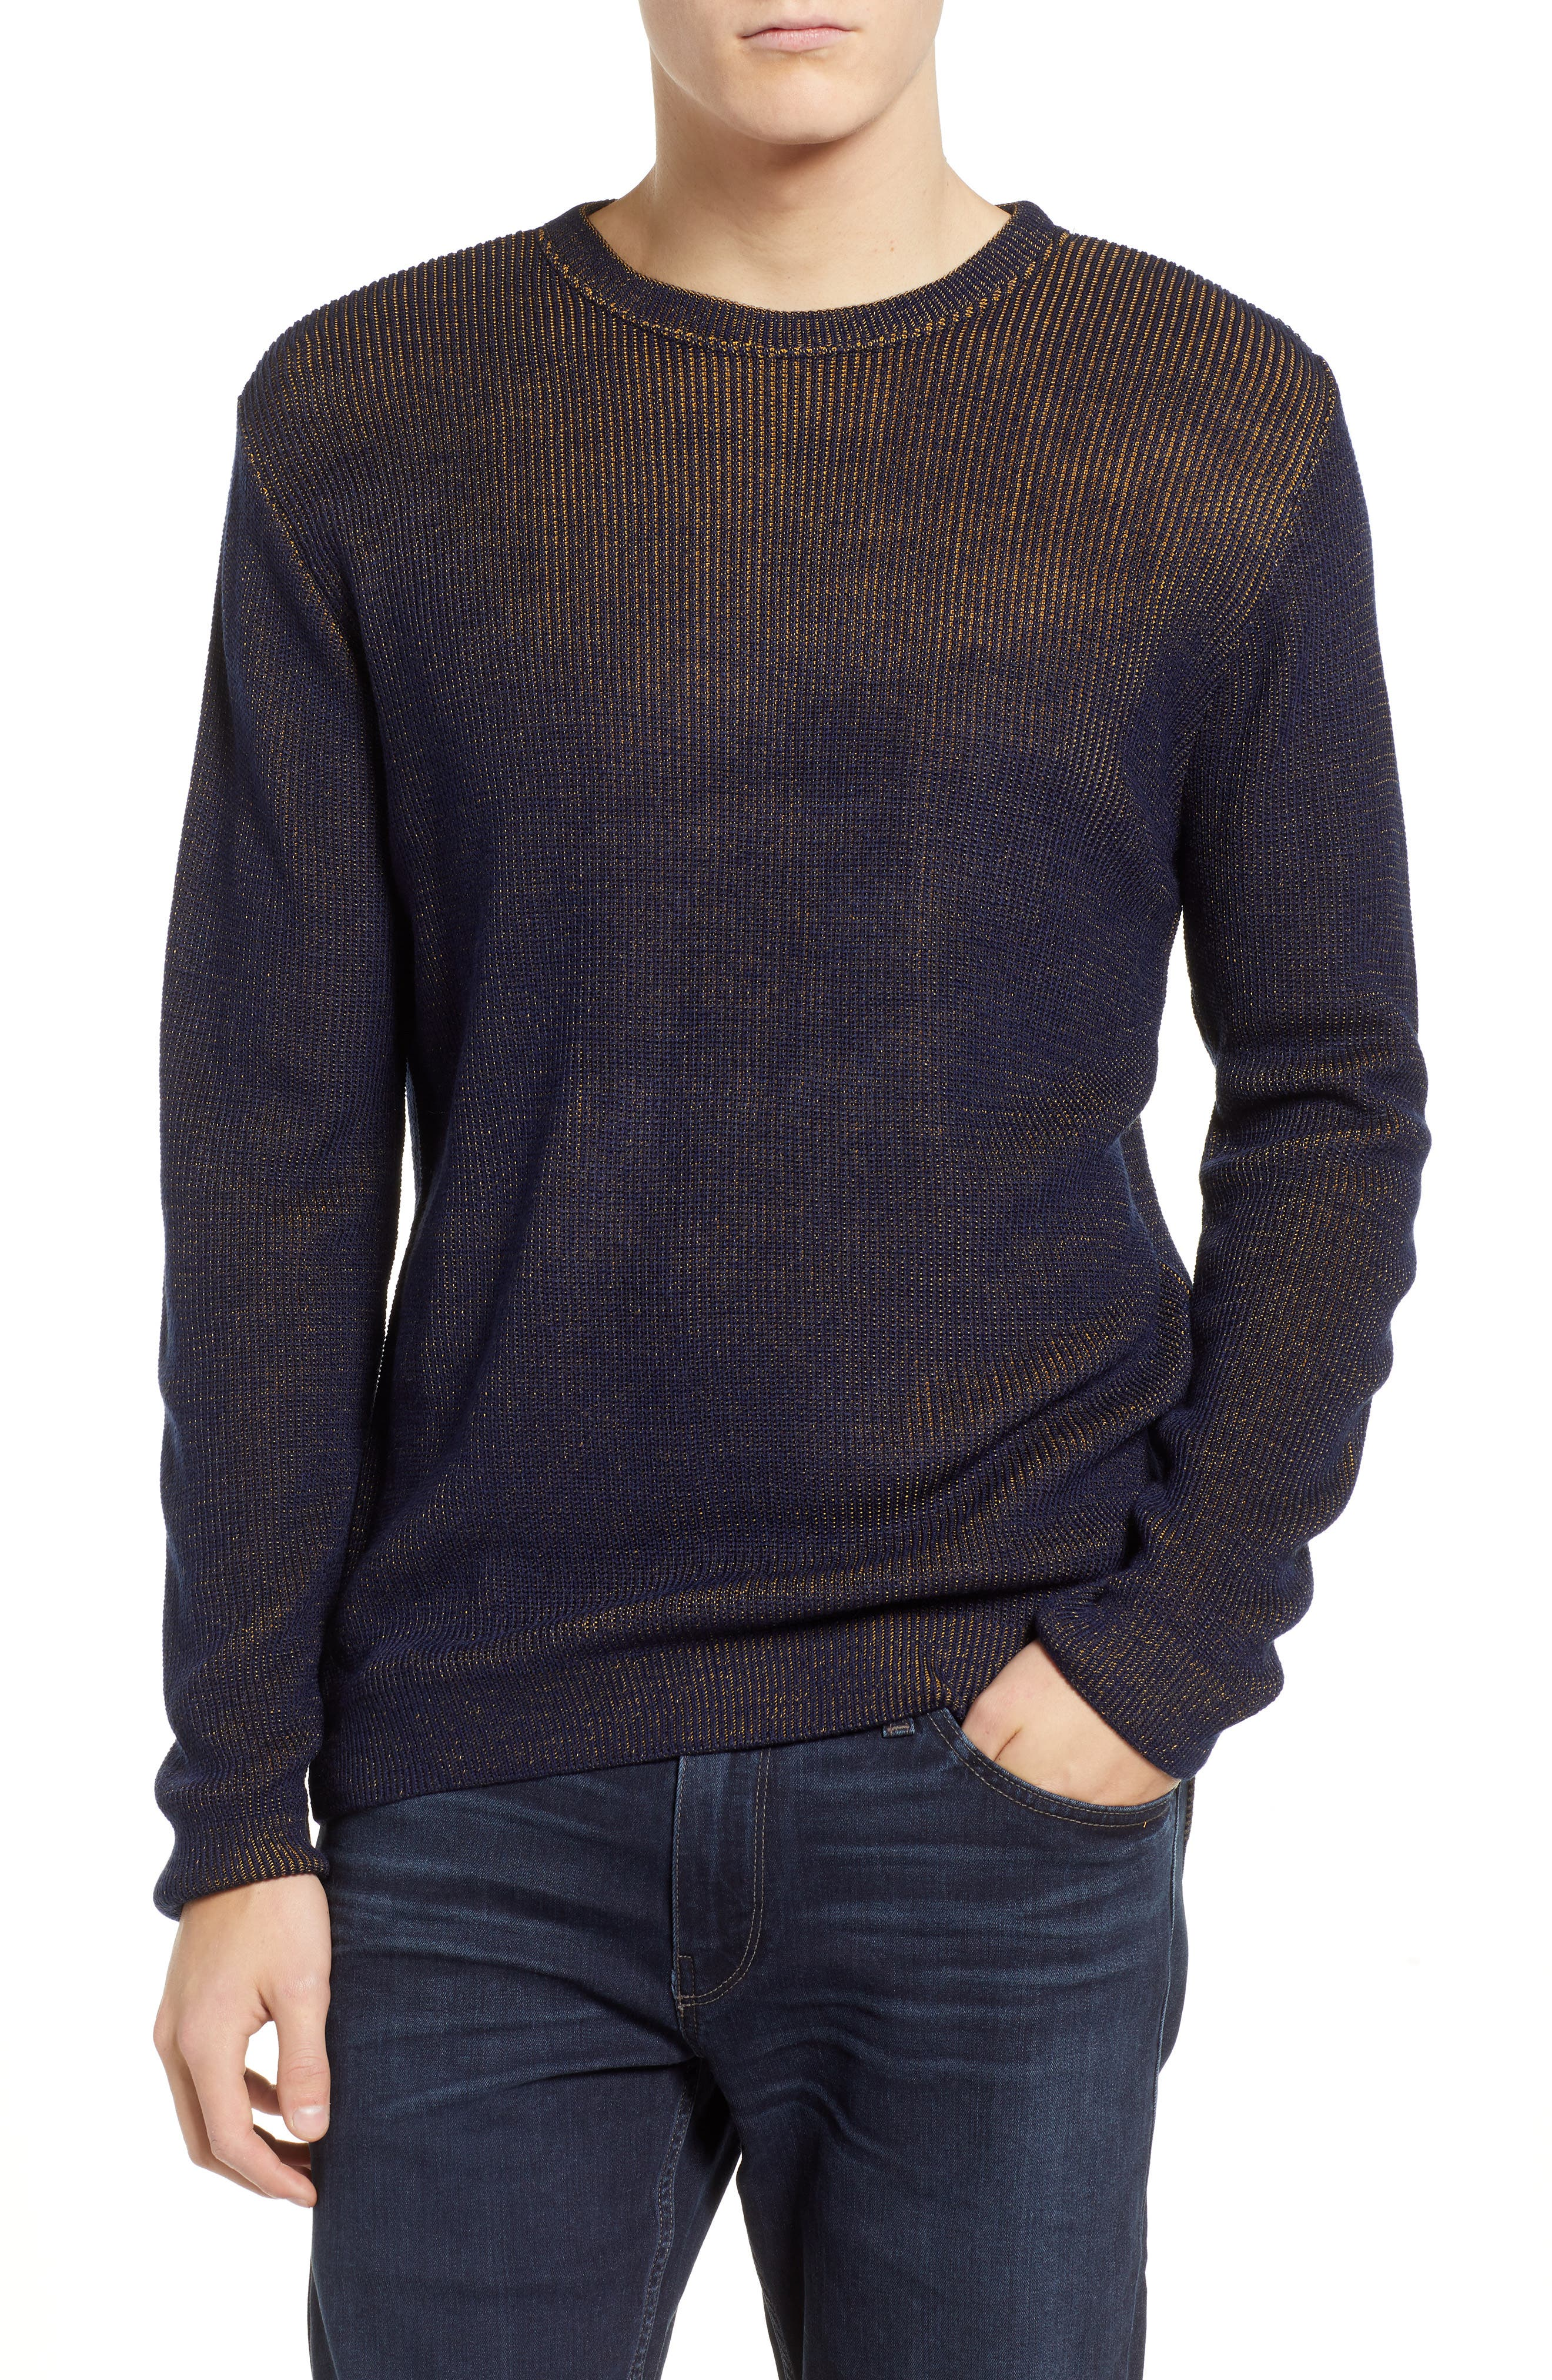 VESTIGE Plaited Crewneck Sweater in Navy